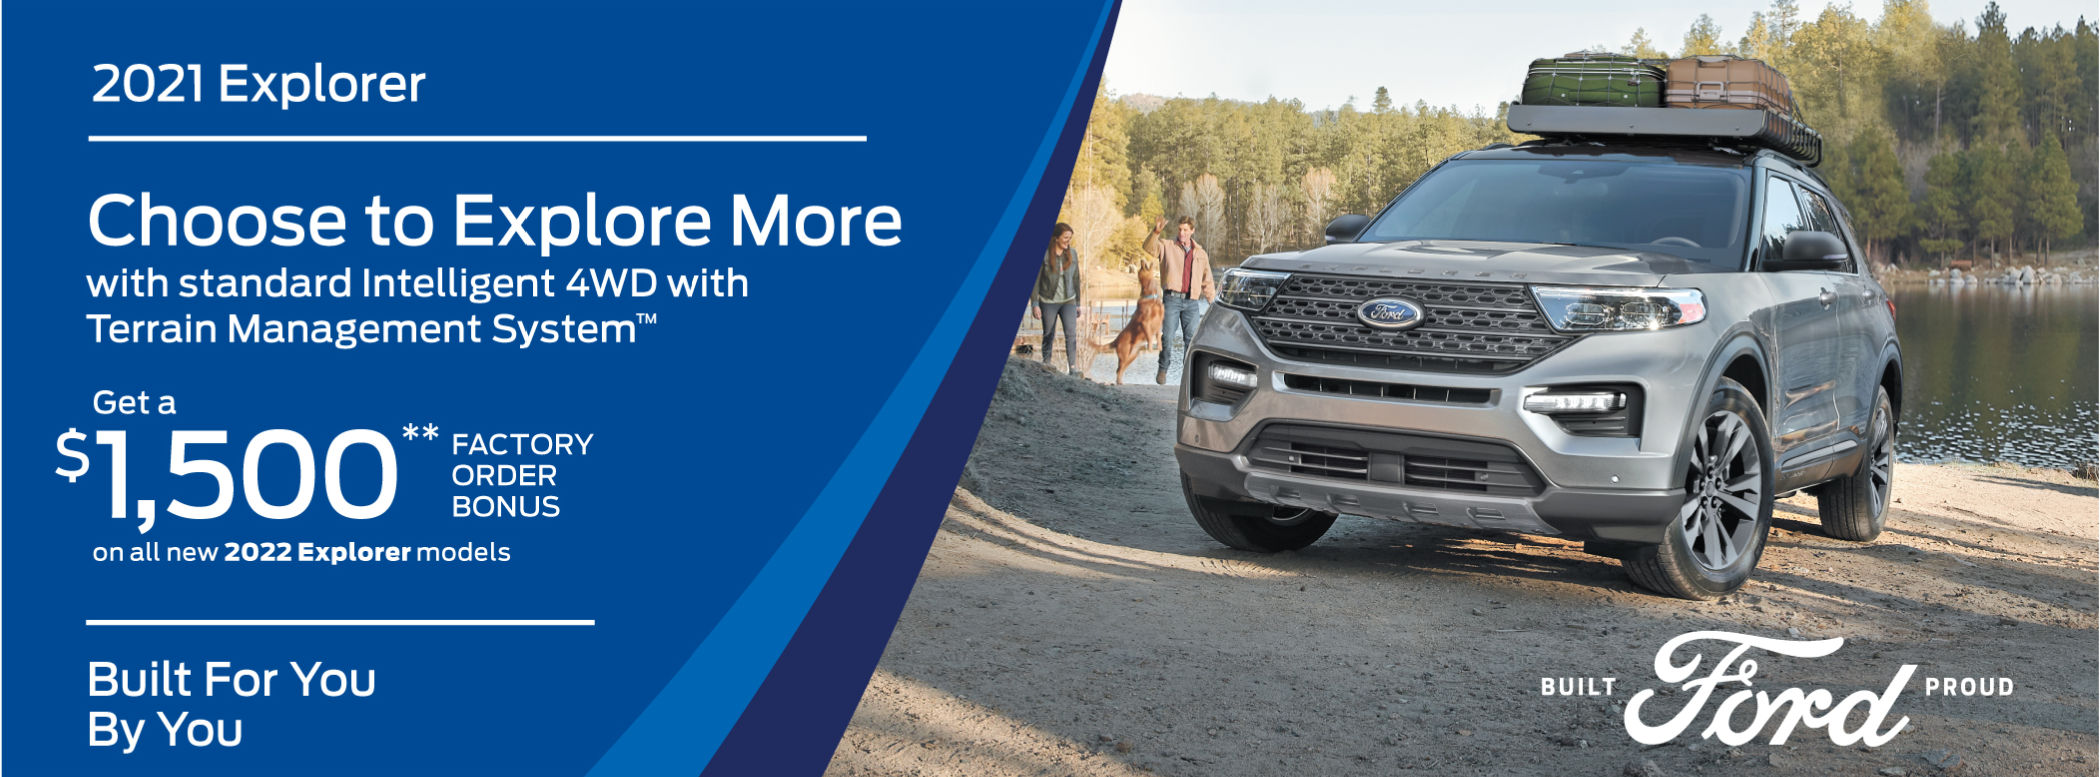 Ford Explorer Special Offer